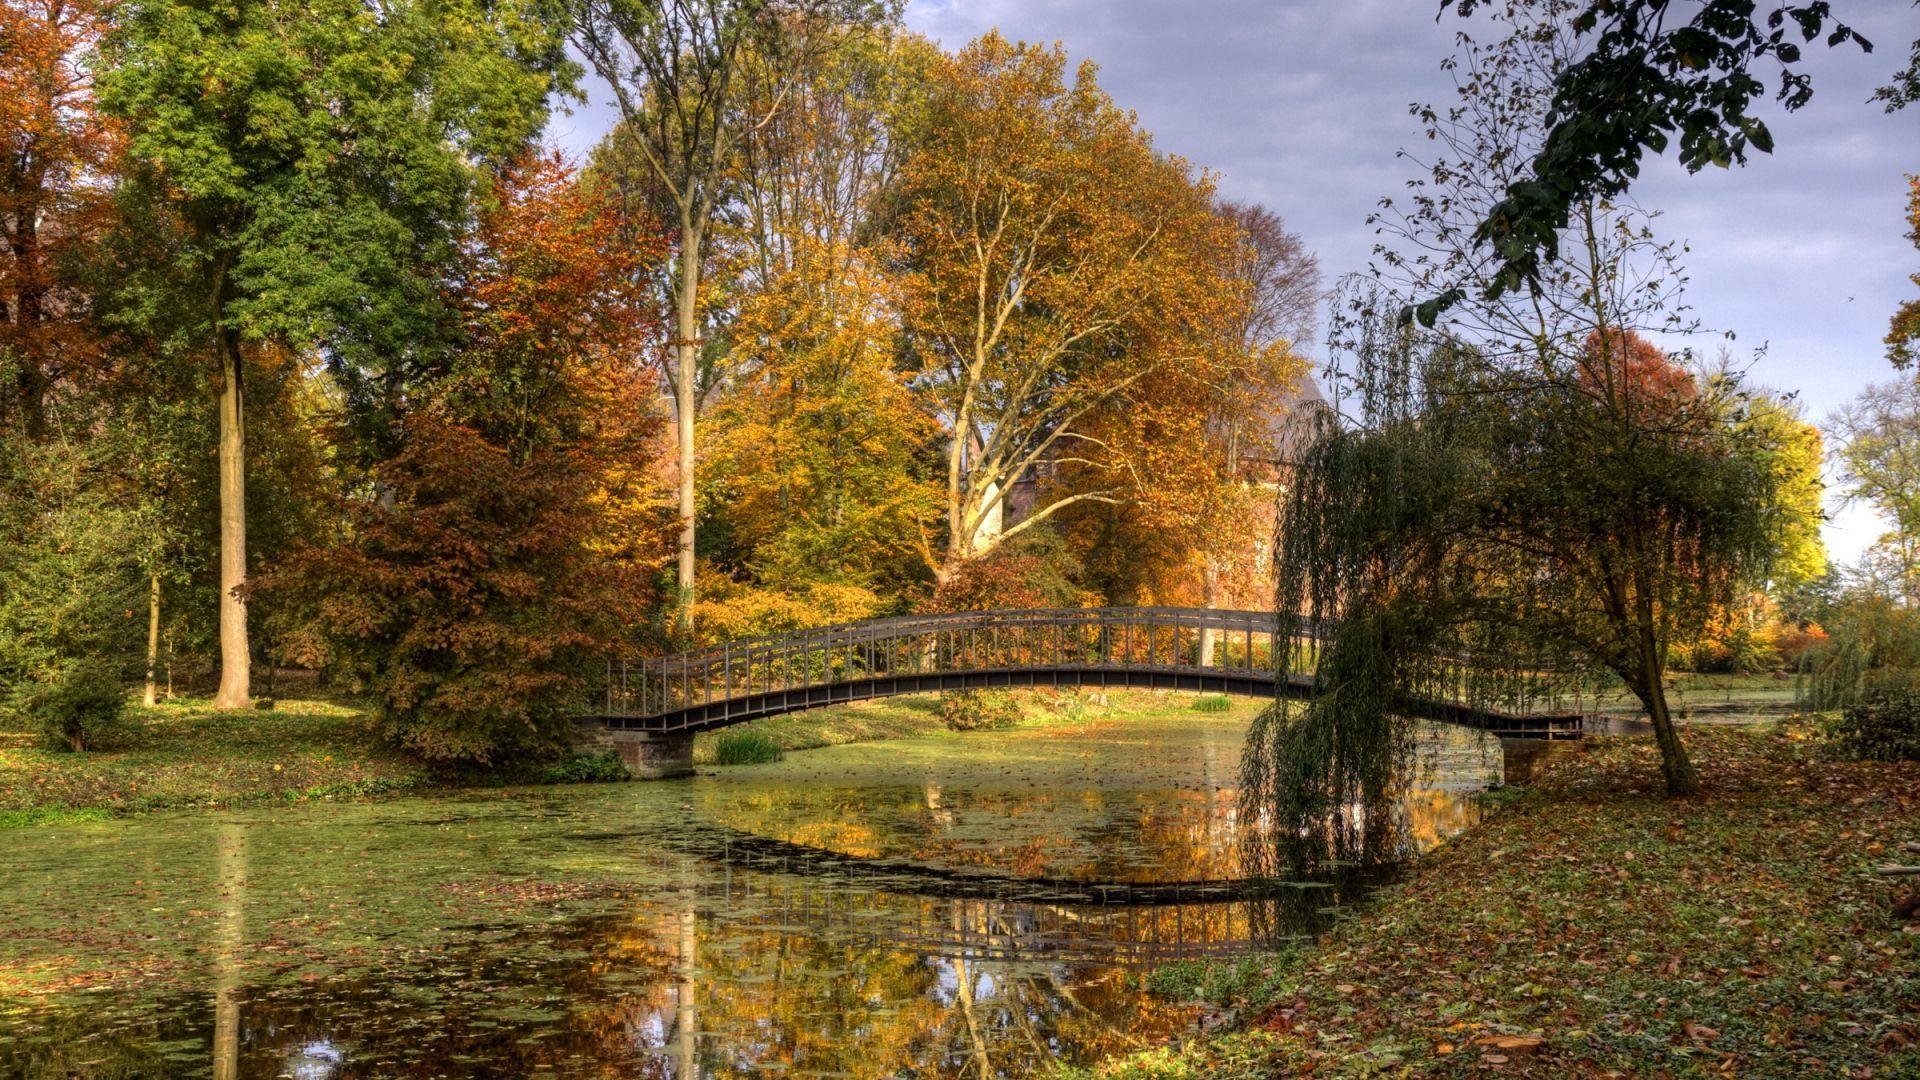 Fall Hd Wallpapers 1080p Widescreen Netherlands Wallpapers Wallpaper Cave